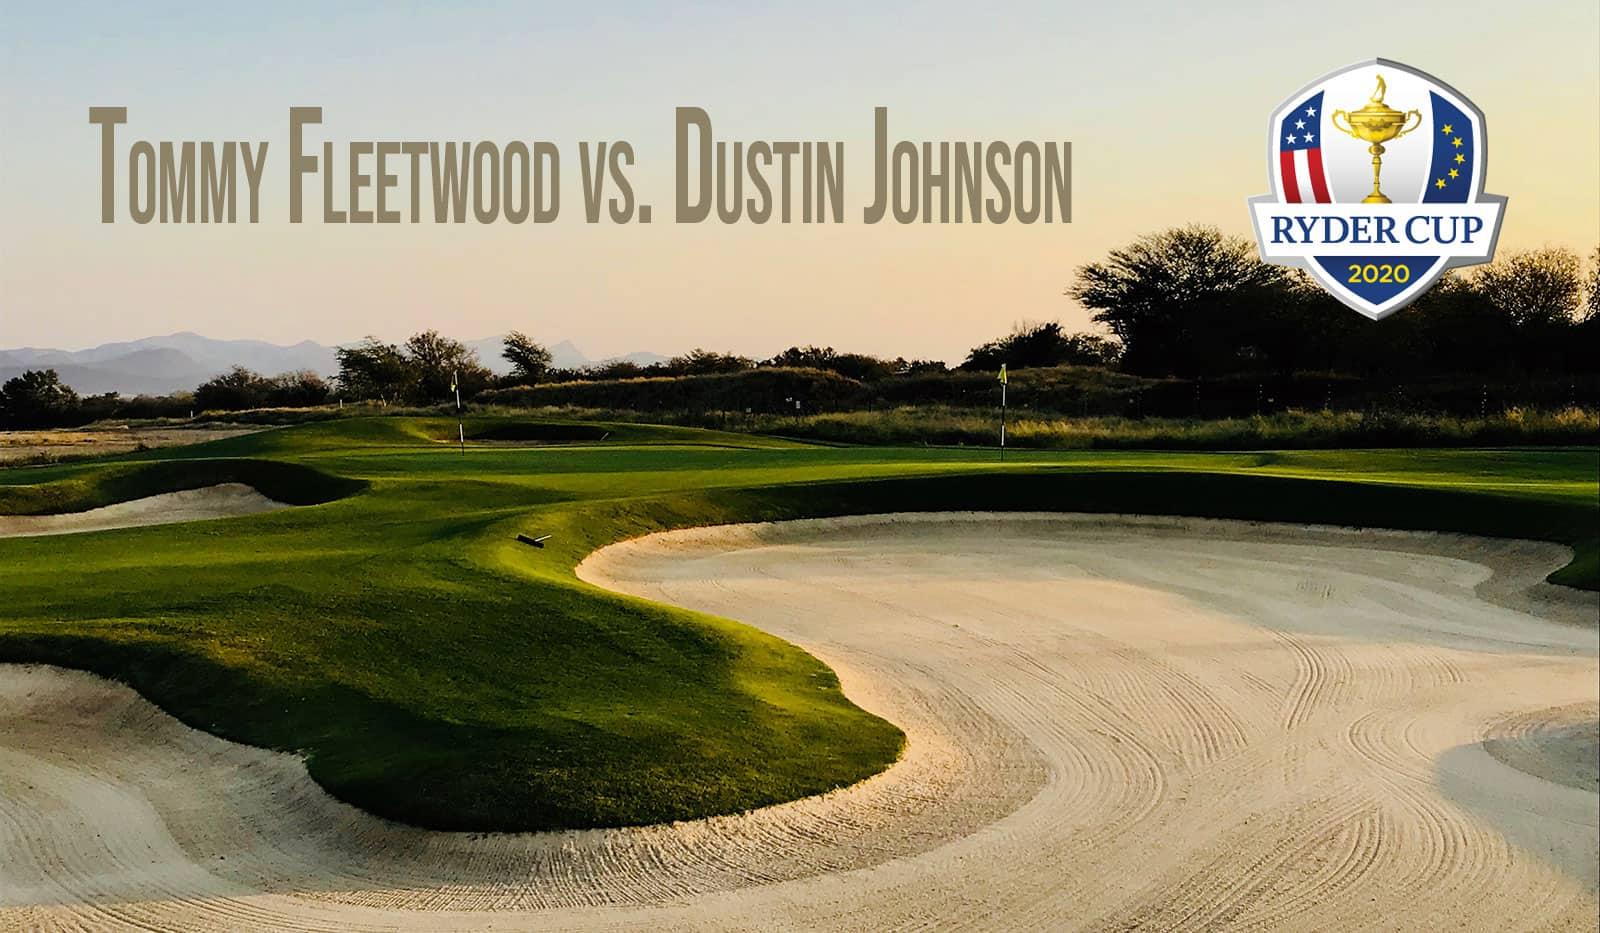 "Golfplatz, Ryder Cup Logo, Schriftzug ""Tommy Fleetwood vs. Dustin Johnson"